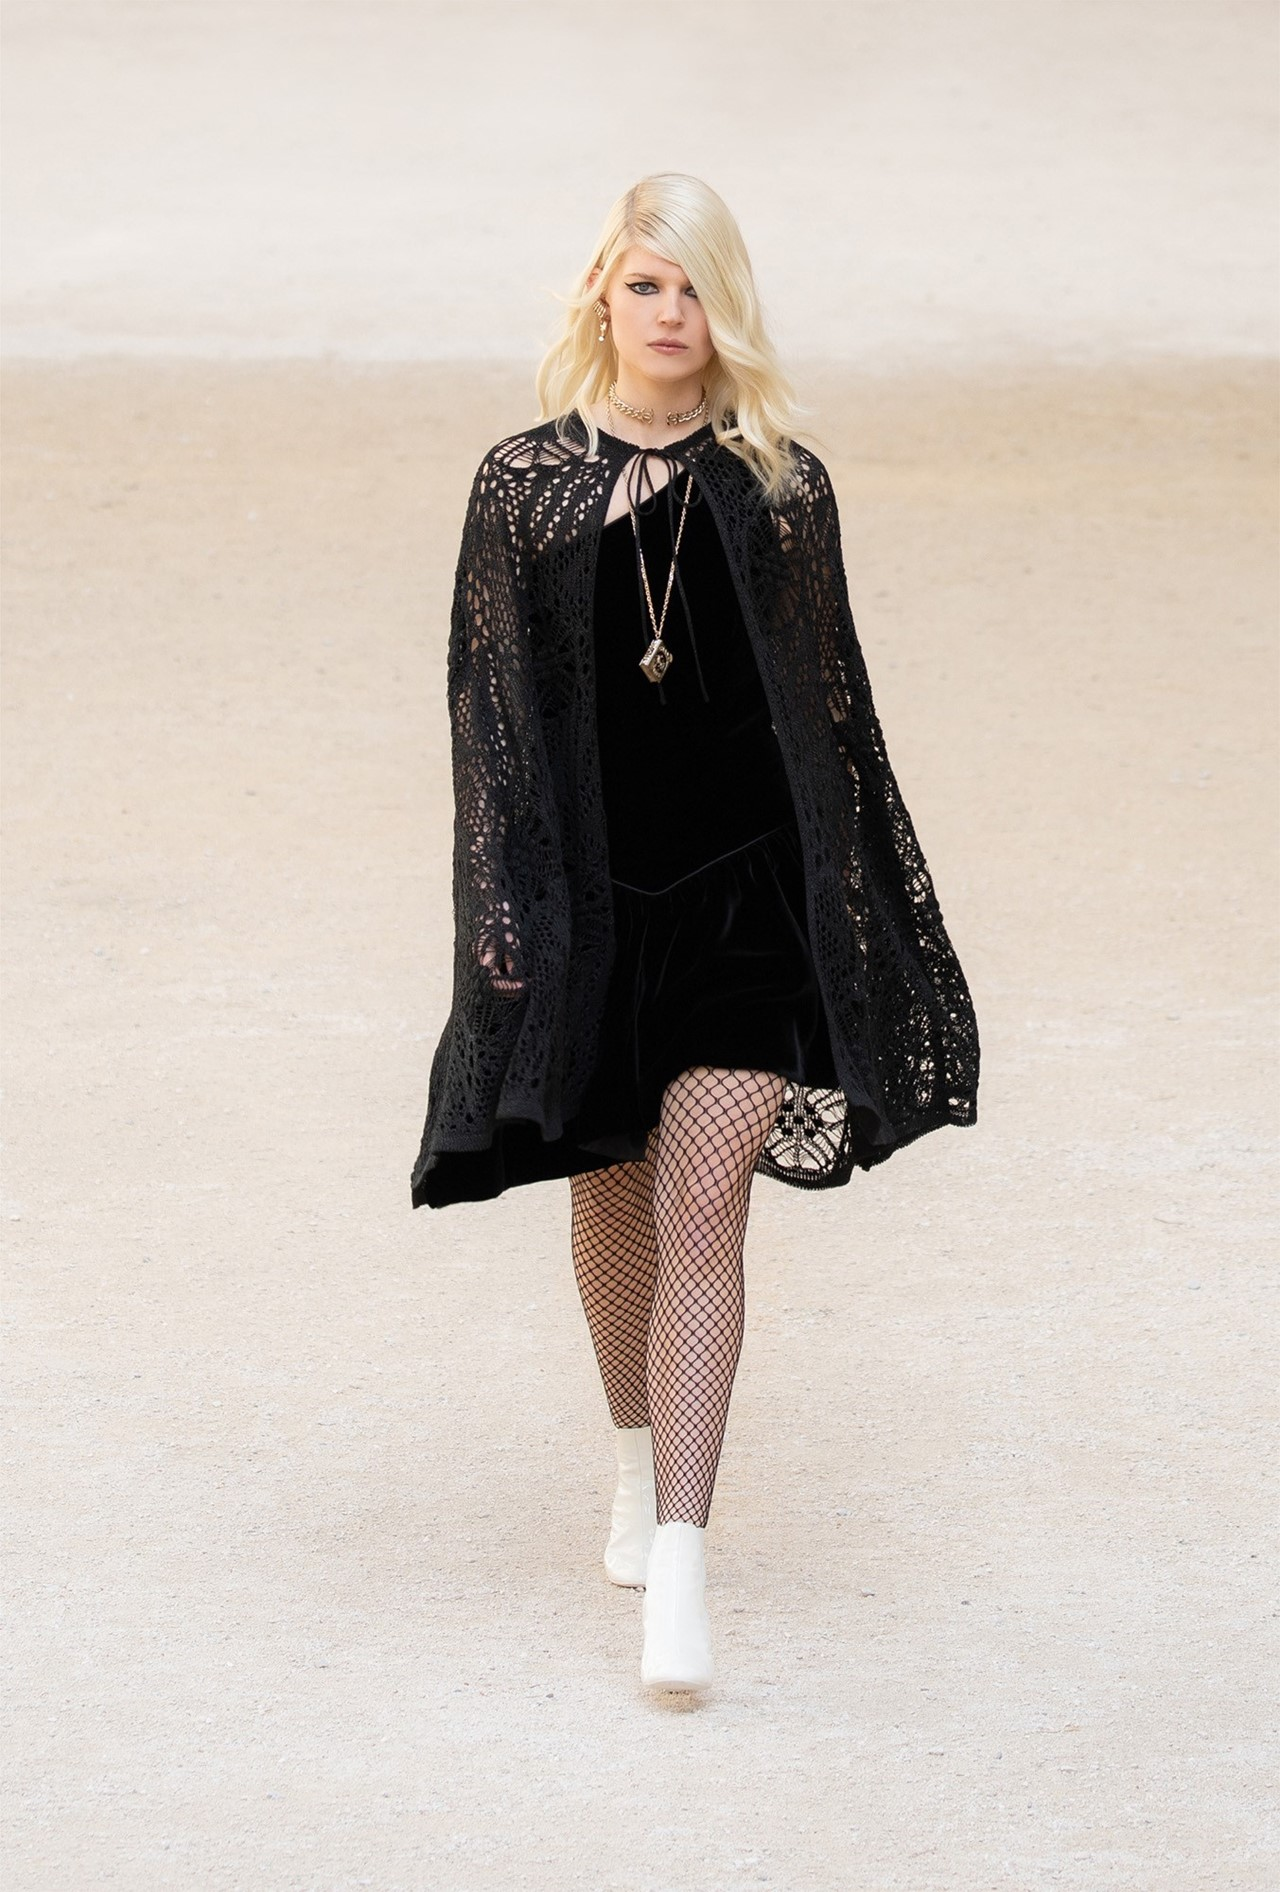 Chanel_Cruise_2022_Fashionela (62)